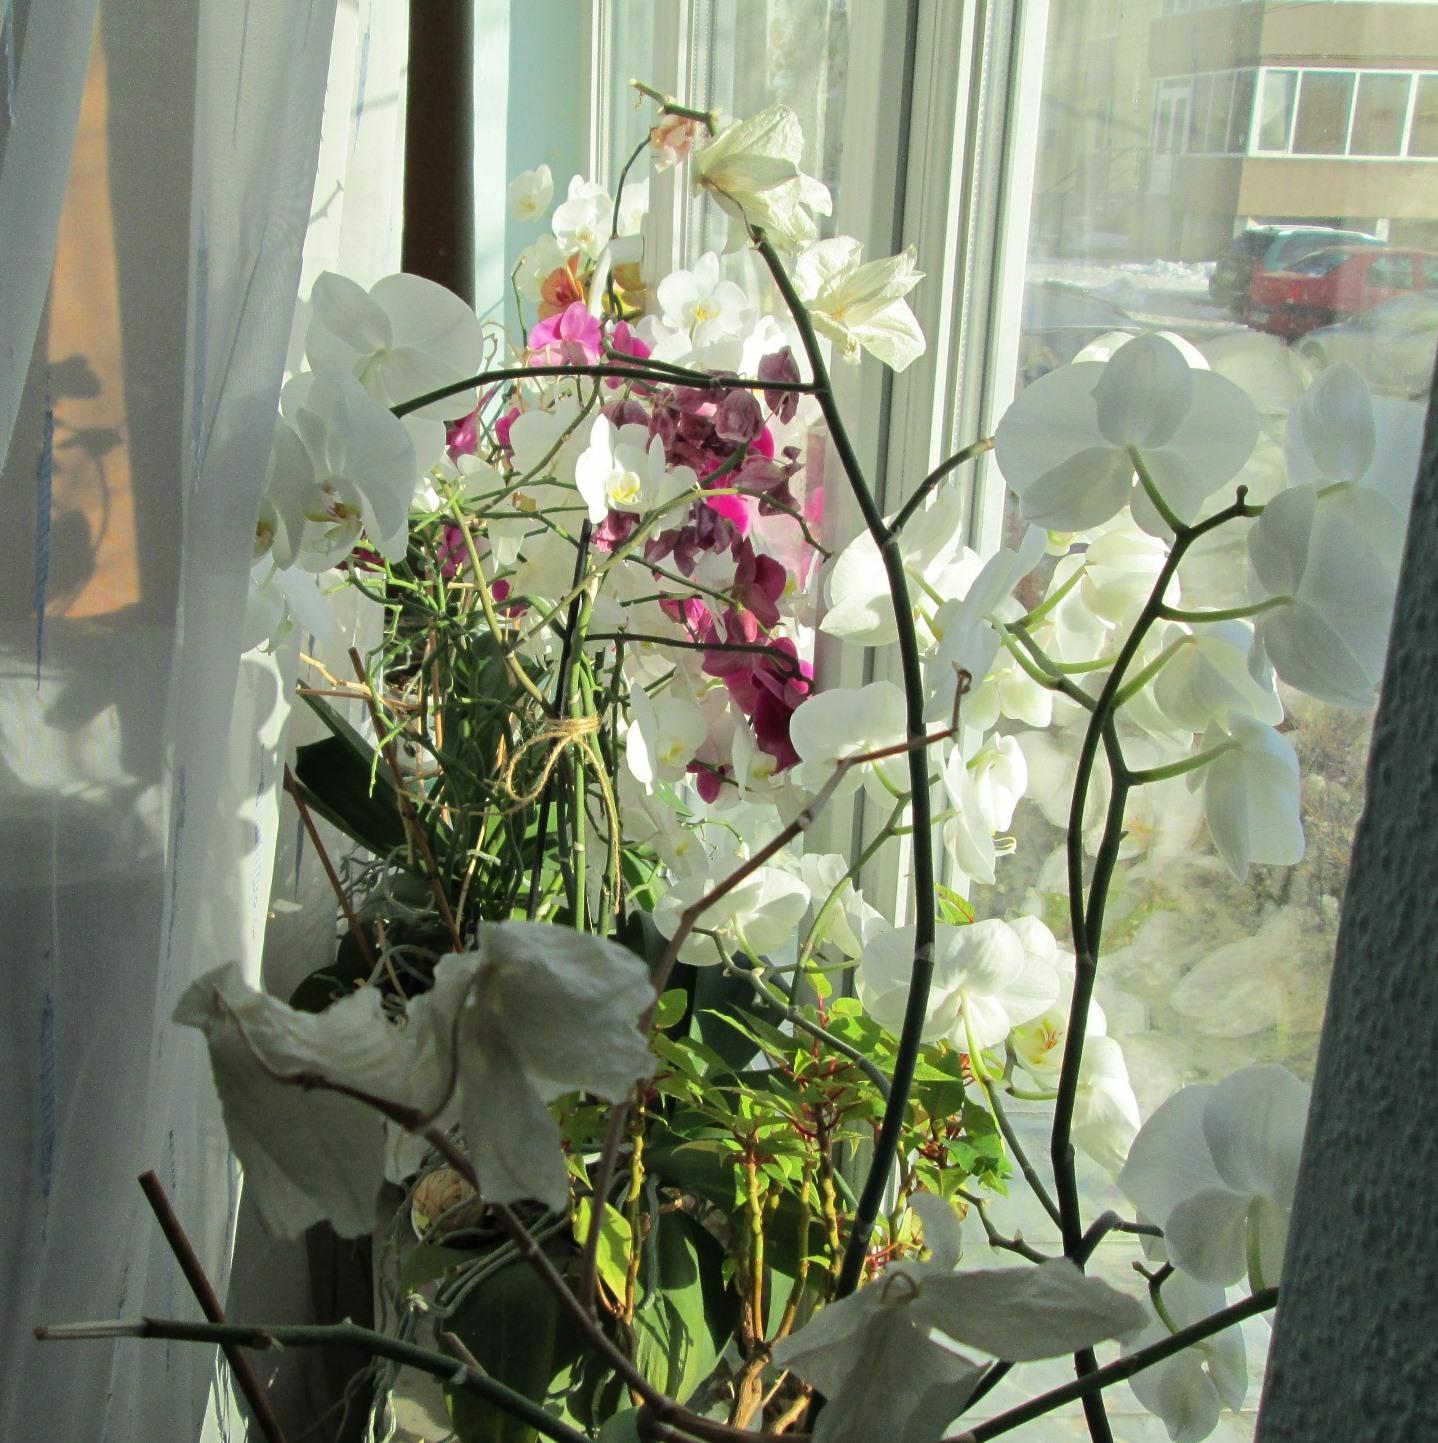 Flori si gradini - Pagina 31 T7inw8